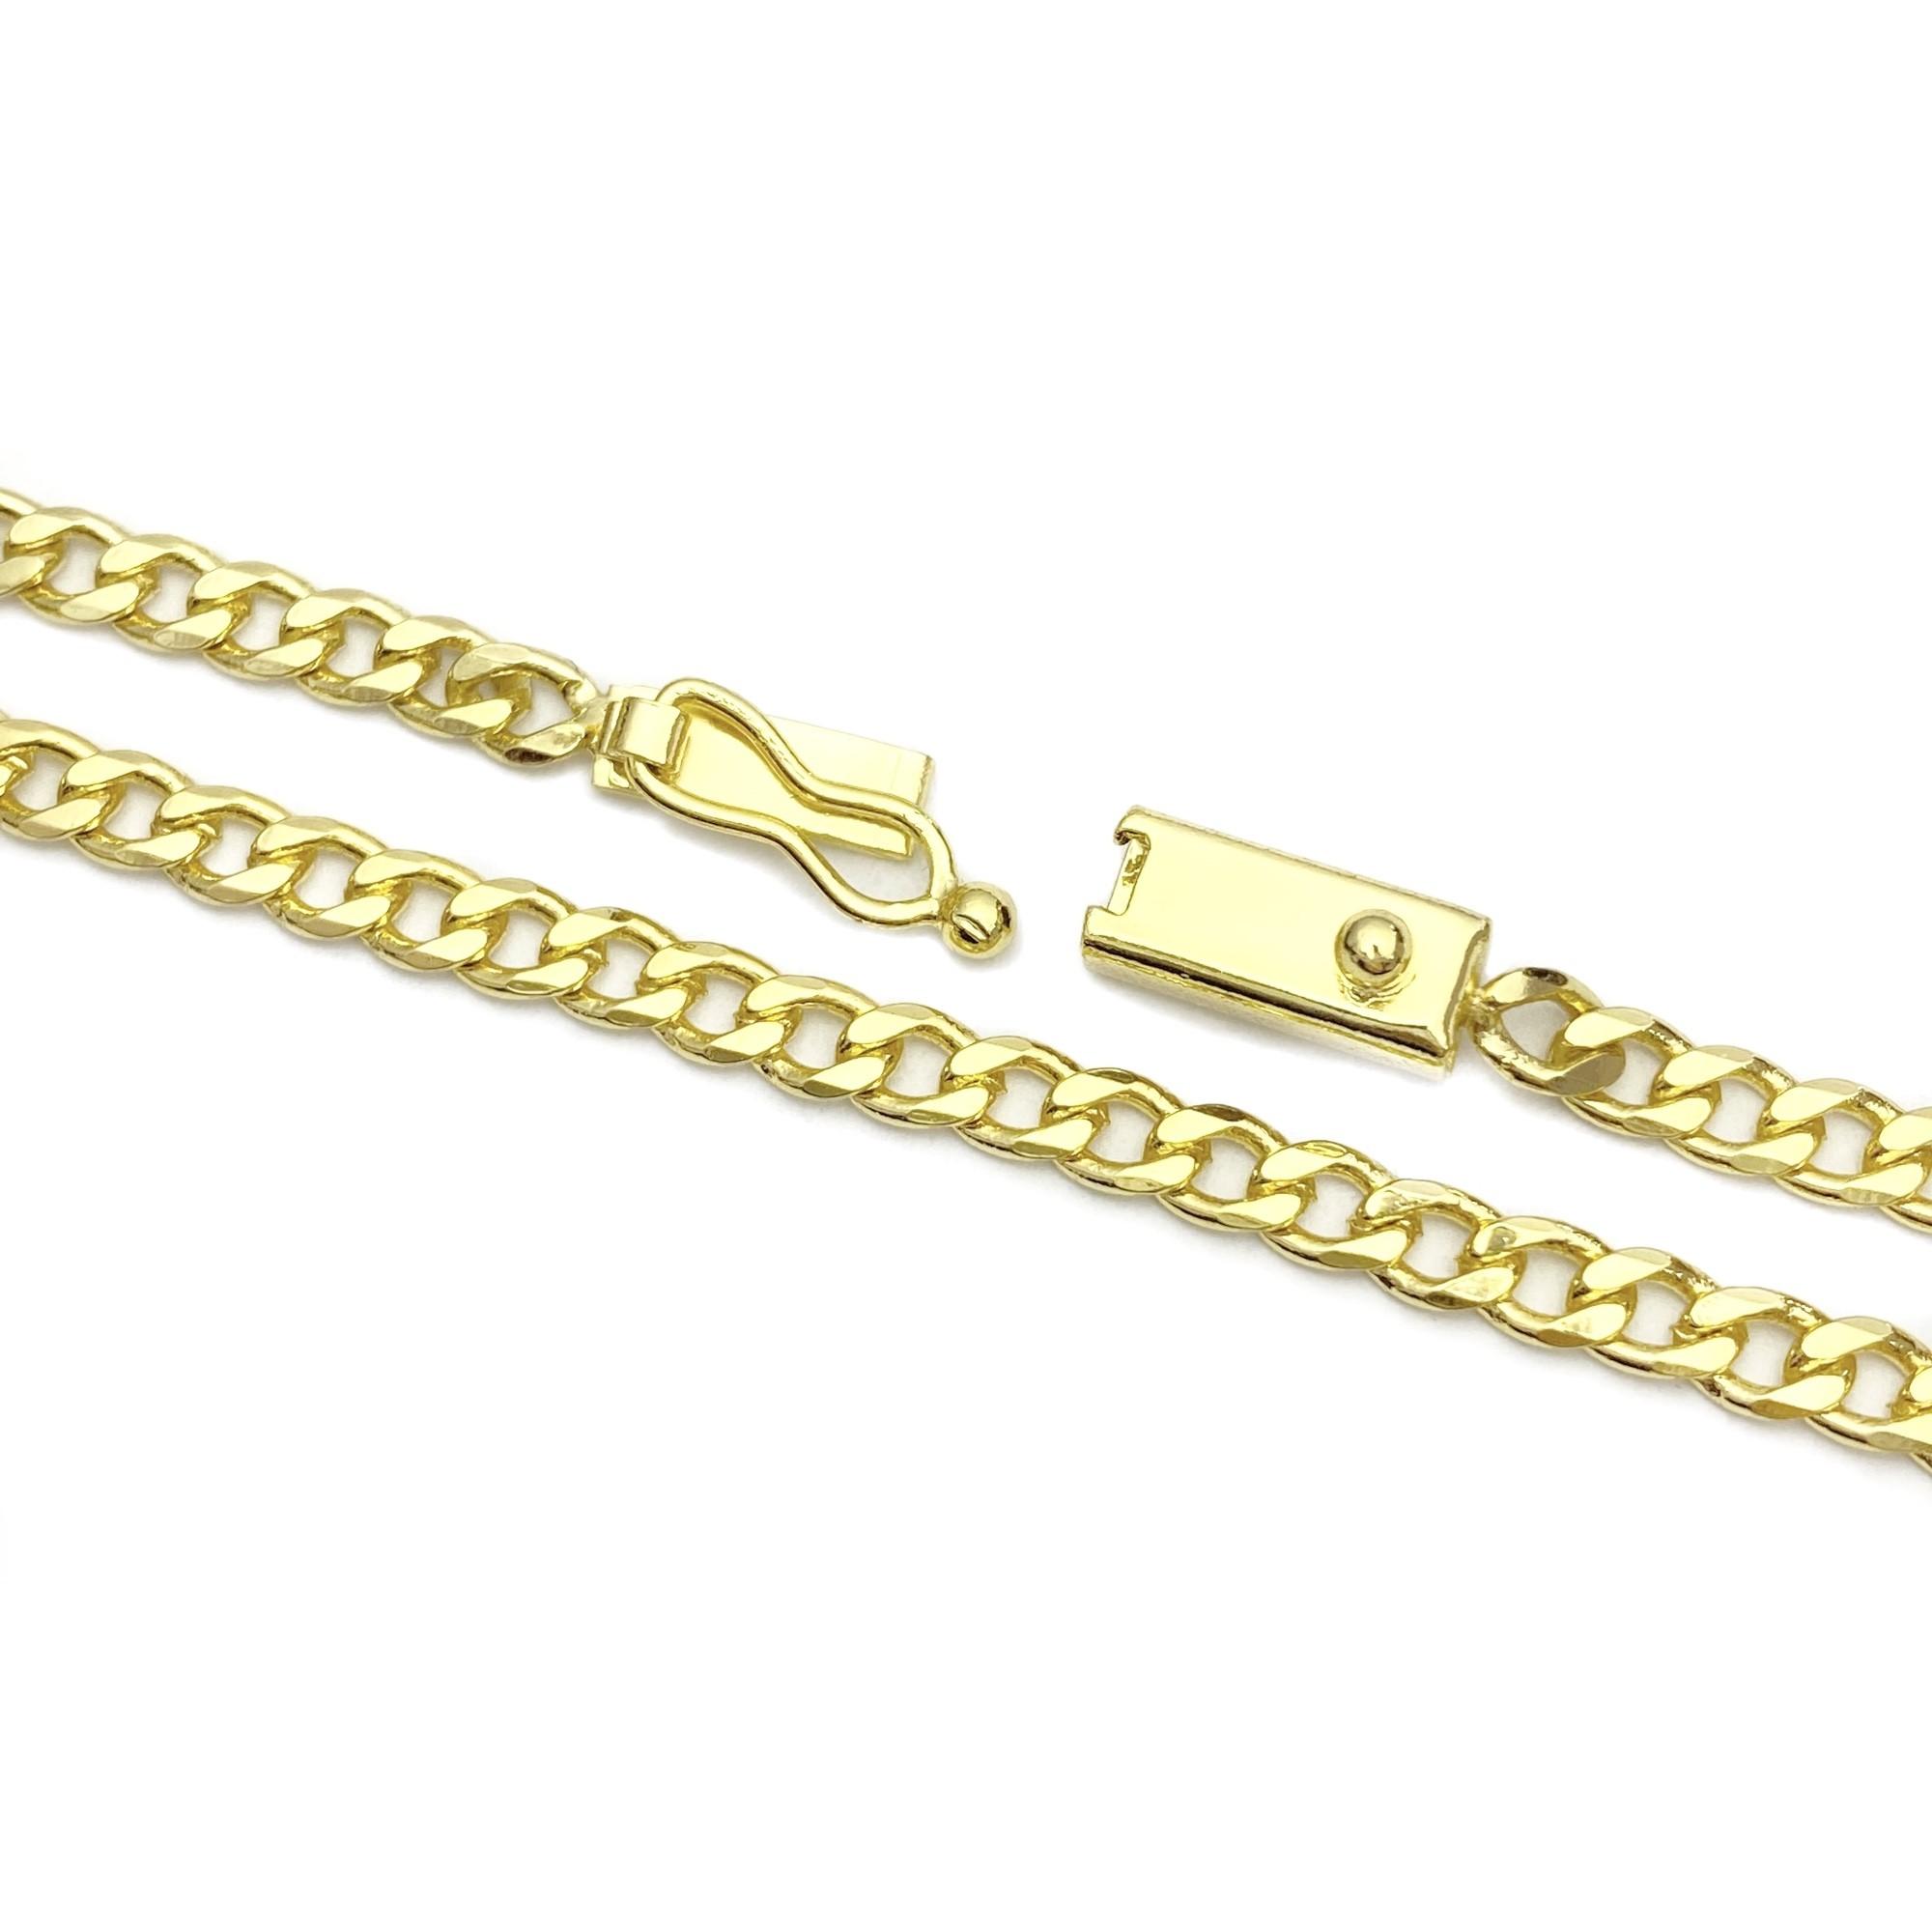 Corrente Grumet 2,8mm 60cm 11g (Fecho Gaveta) (Banho Ouro 24k)